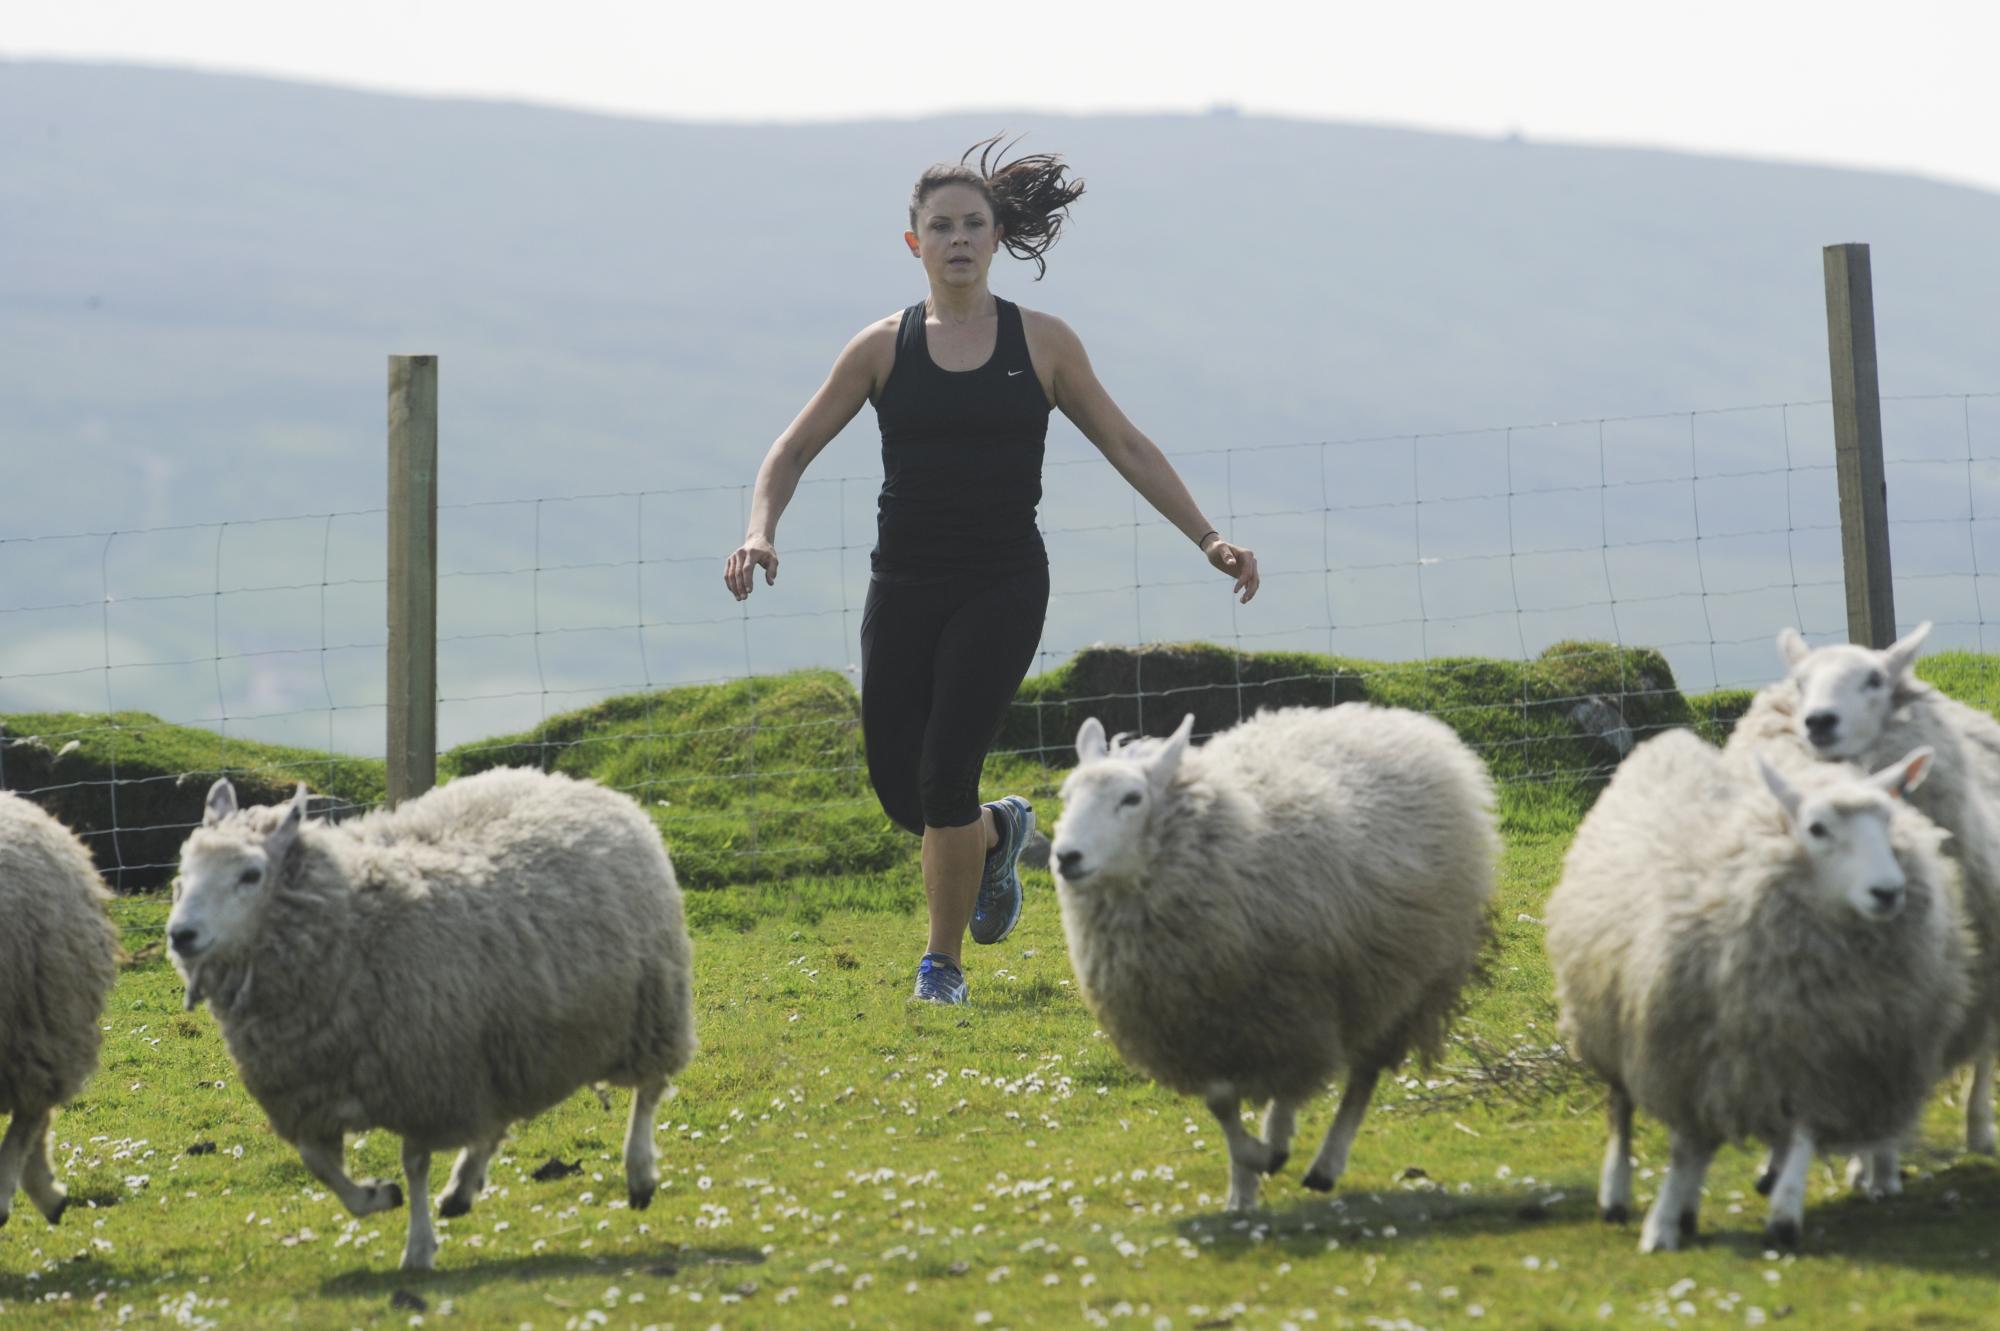 Running after sheep